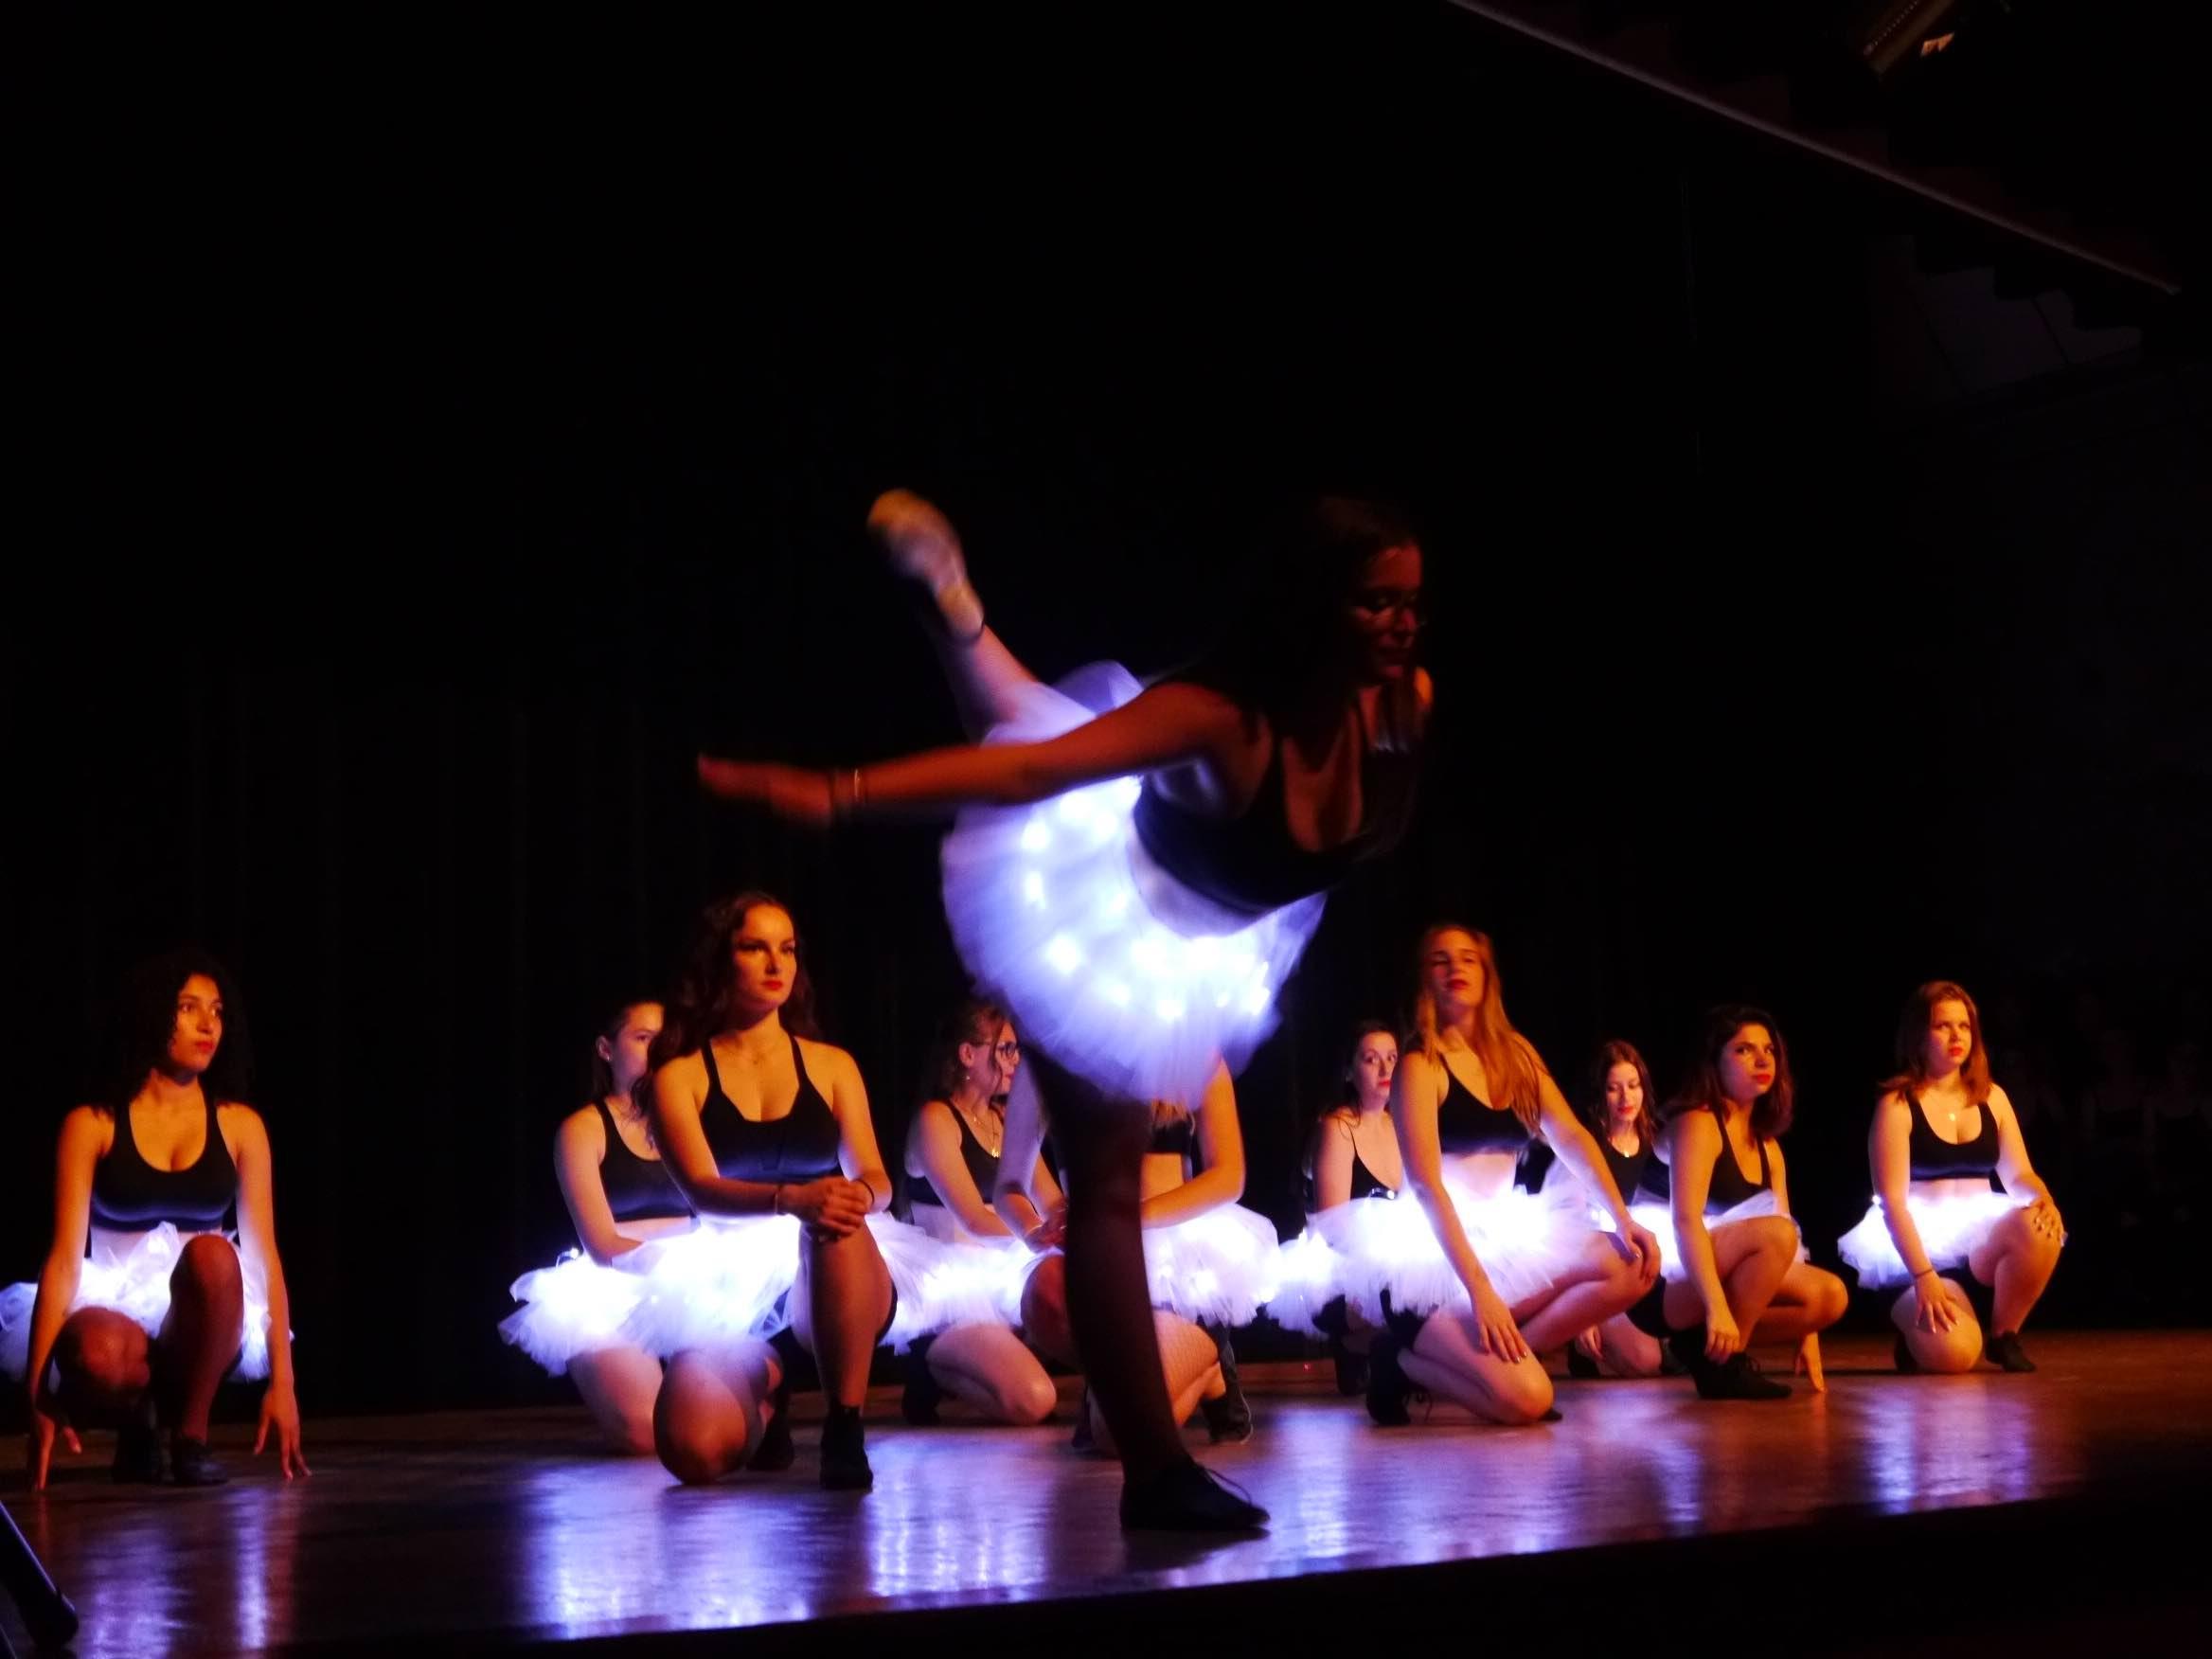 gala-danse-rythmique-fli-pompey 7 (65)